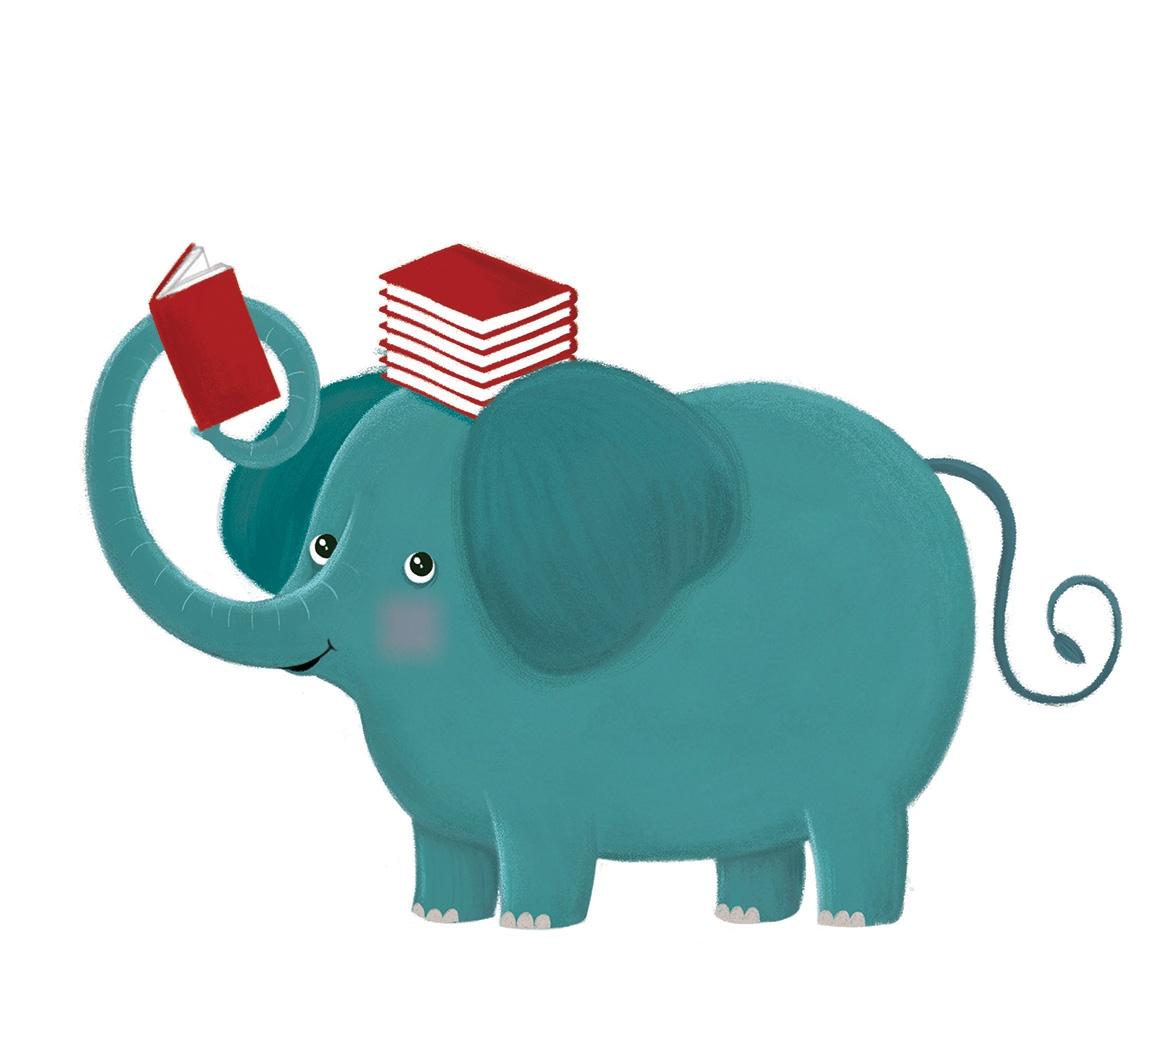 Mascot for a kid's book club